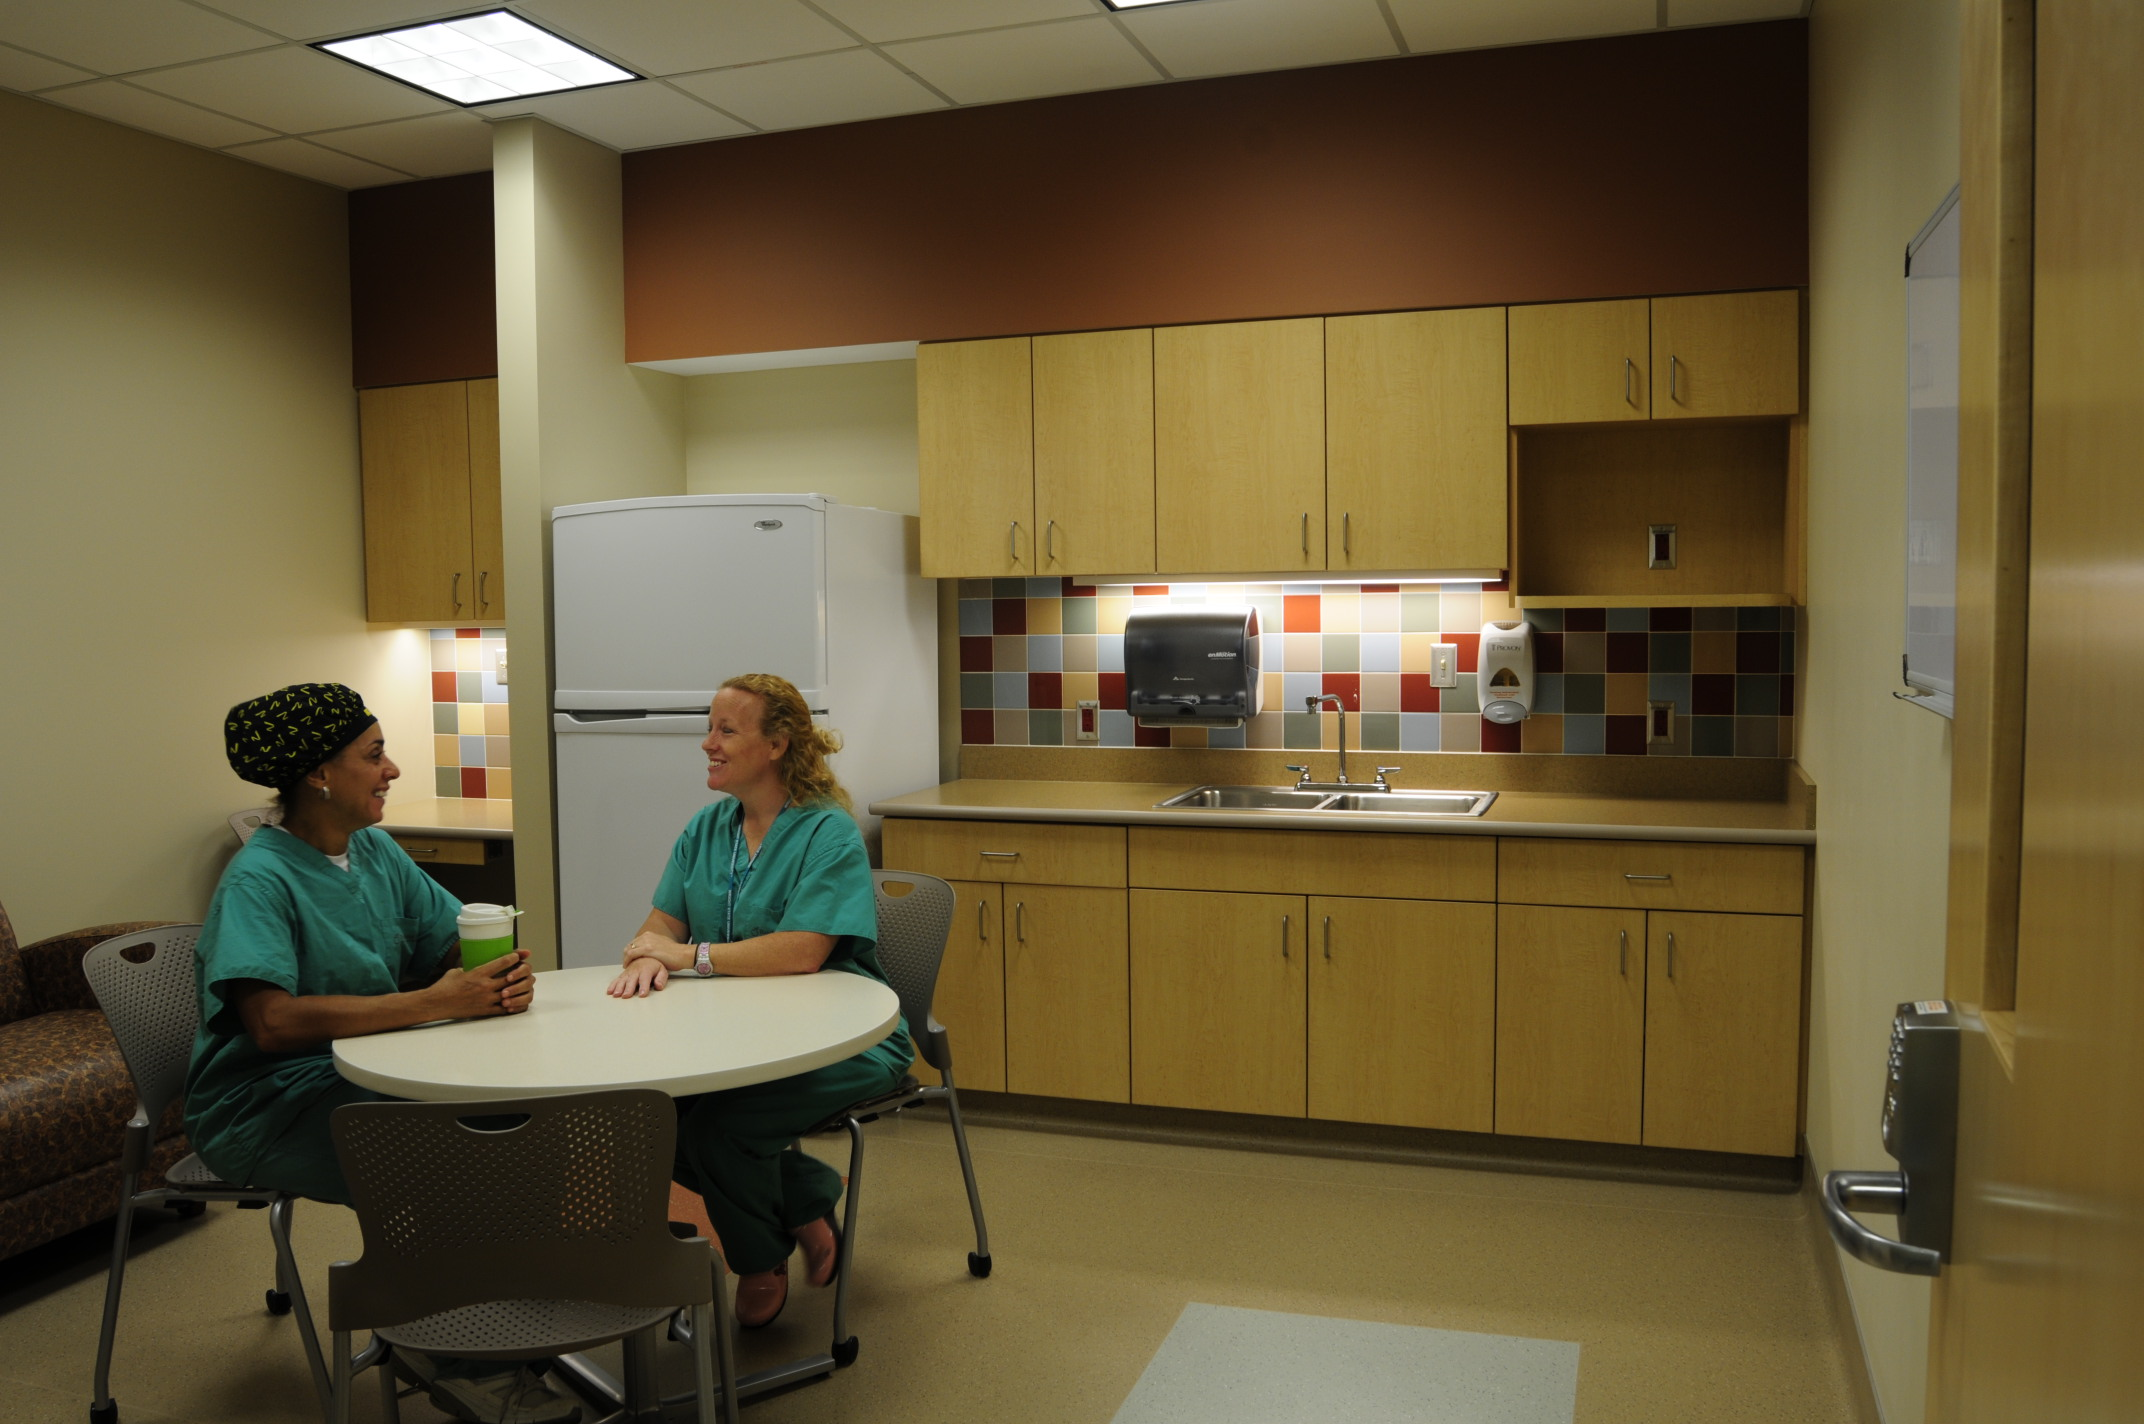 www.rcmarchitects.com - bvhs - bluffton hospital (9)